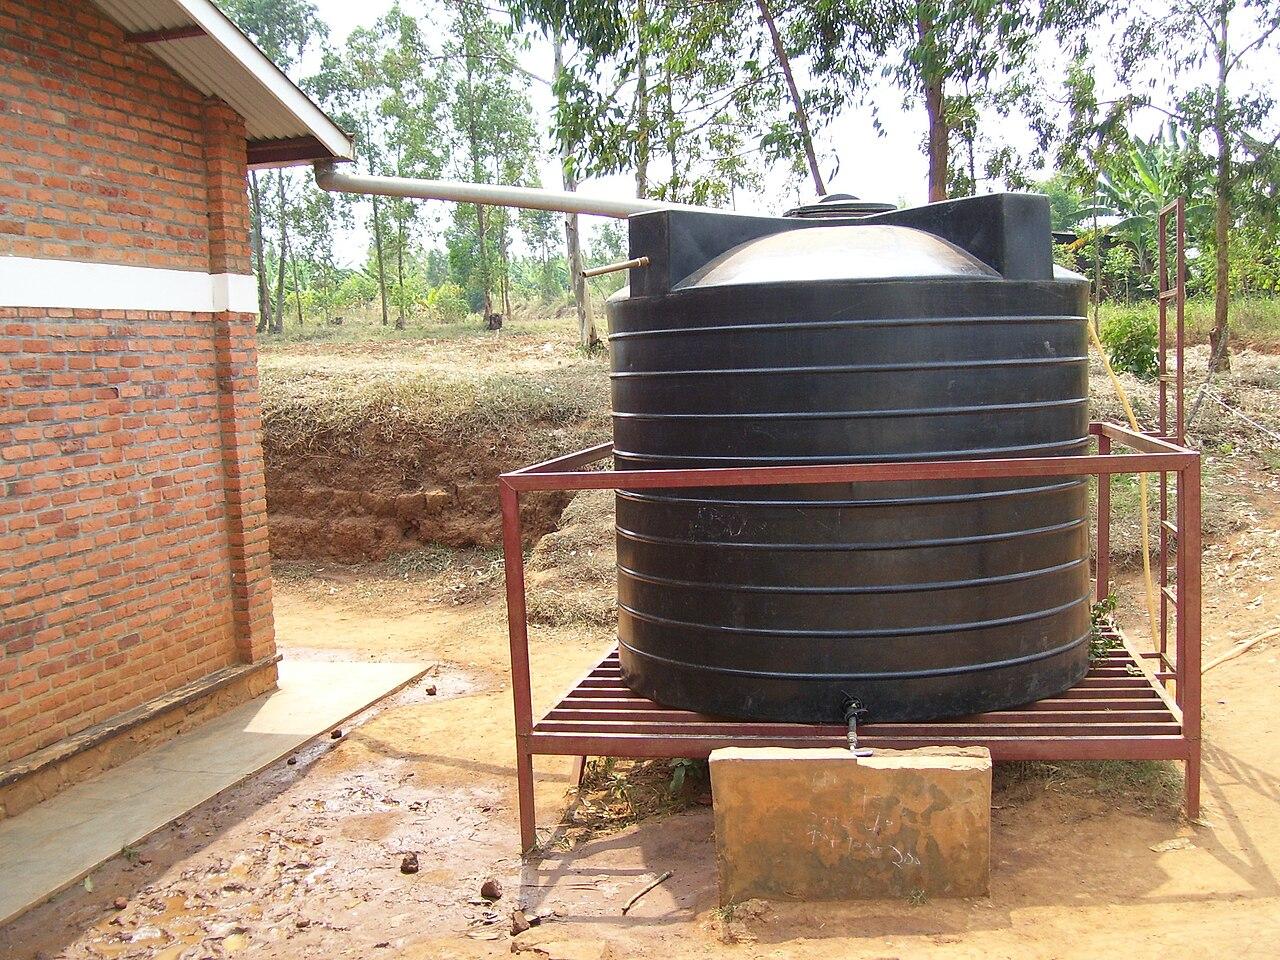 File Rainwater Harvesting Tank 5981896147 Jpg